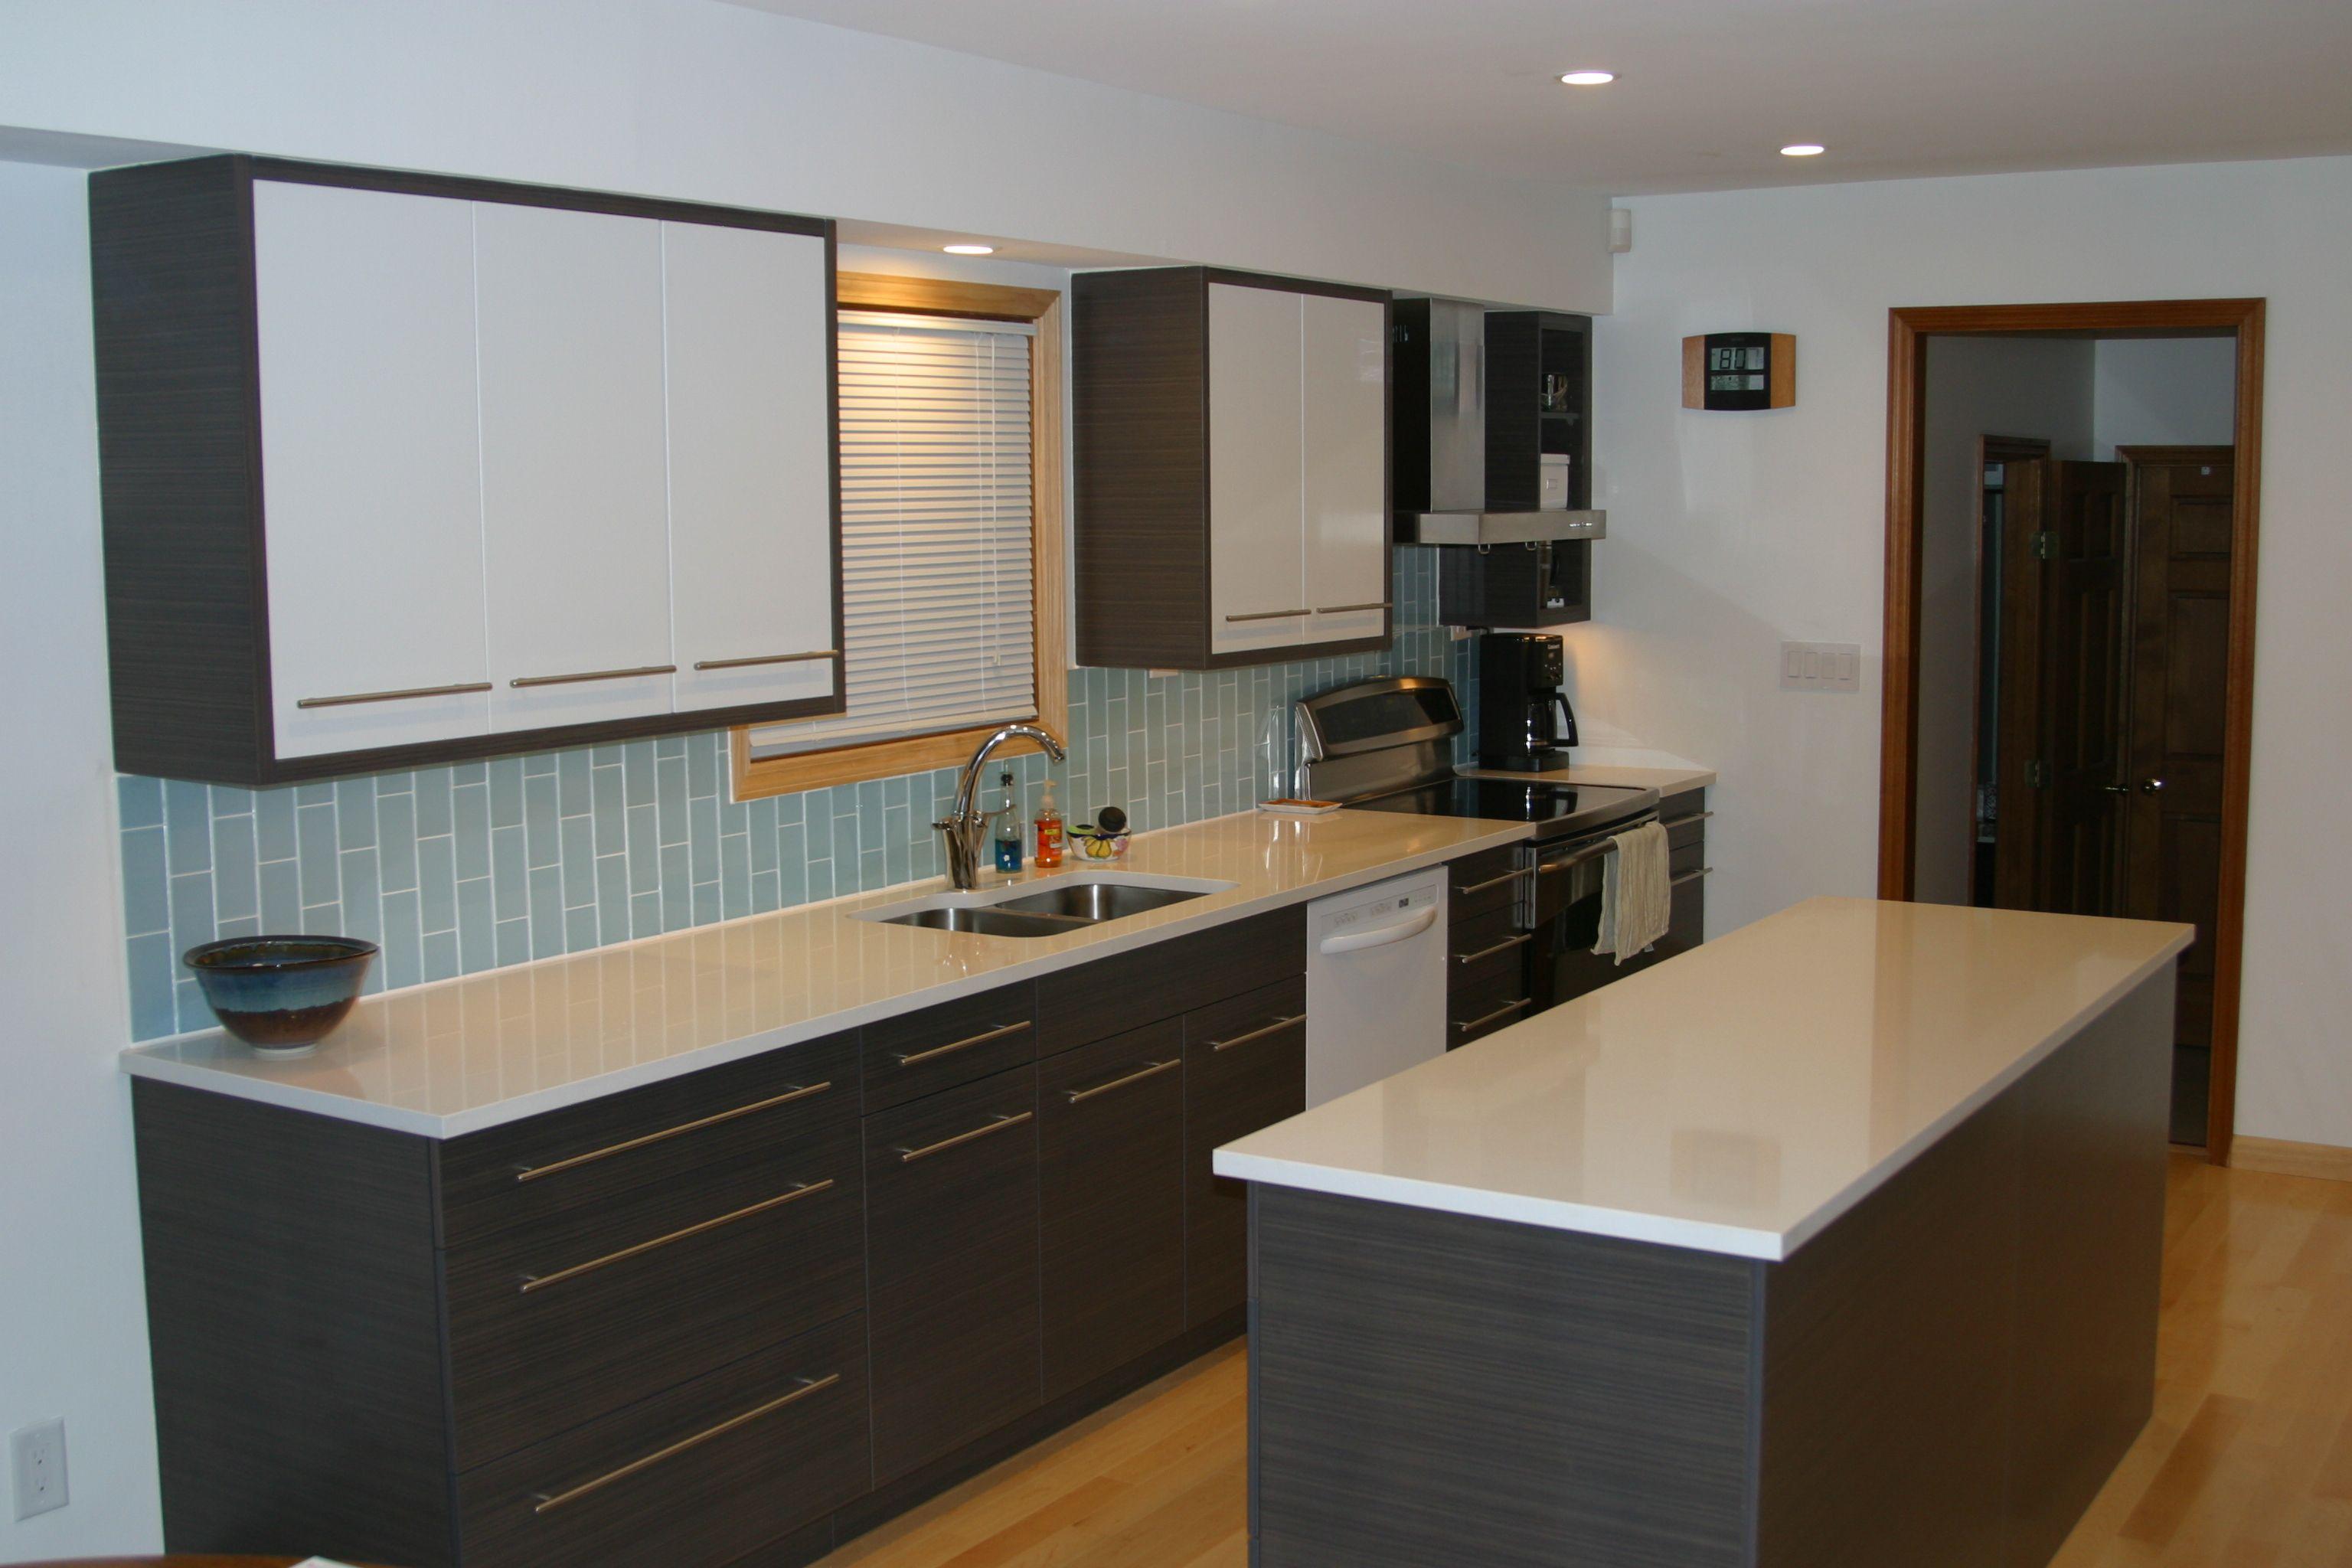 Vapor Glass Subway Tile  Subway Tiles Kitchen Backsplash And Amazing Kitchen Design And Installation Inspiration Design